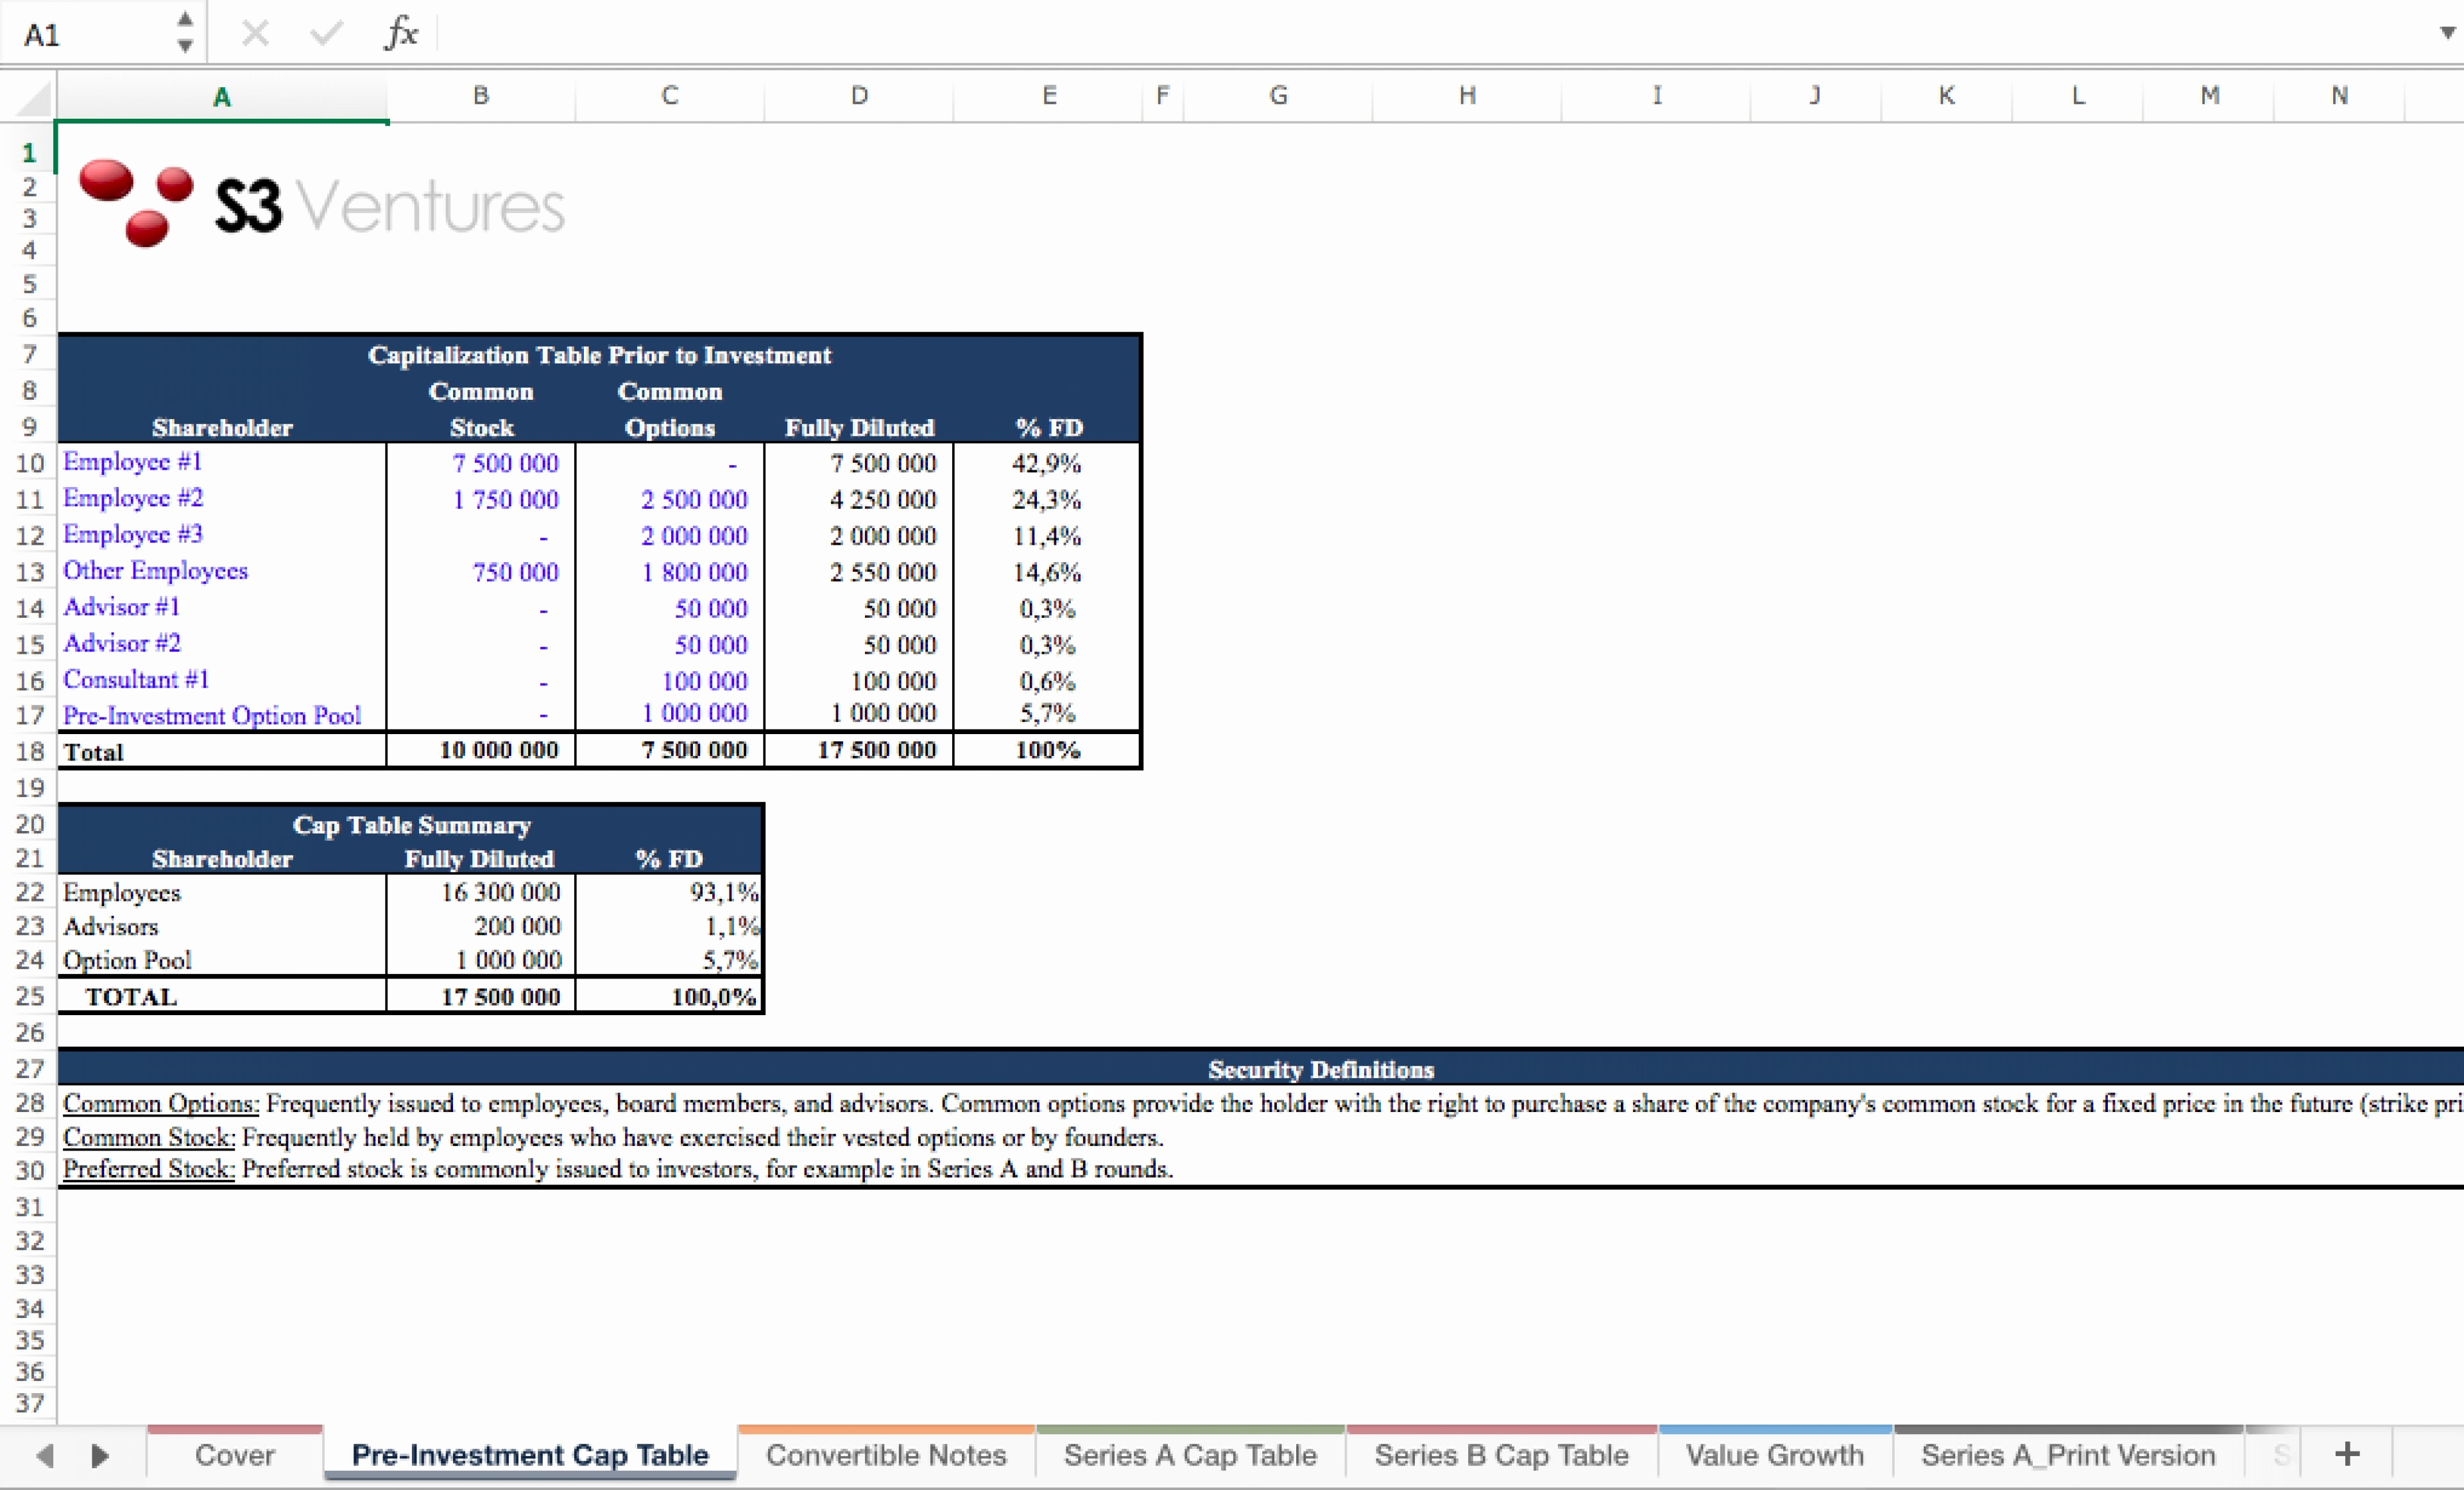 Startup Valuation Spreadsheet Intended For Stock Valuation Spreadsheet Fundamental Analysis Excelate Fresh